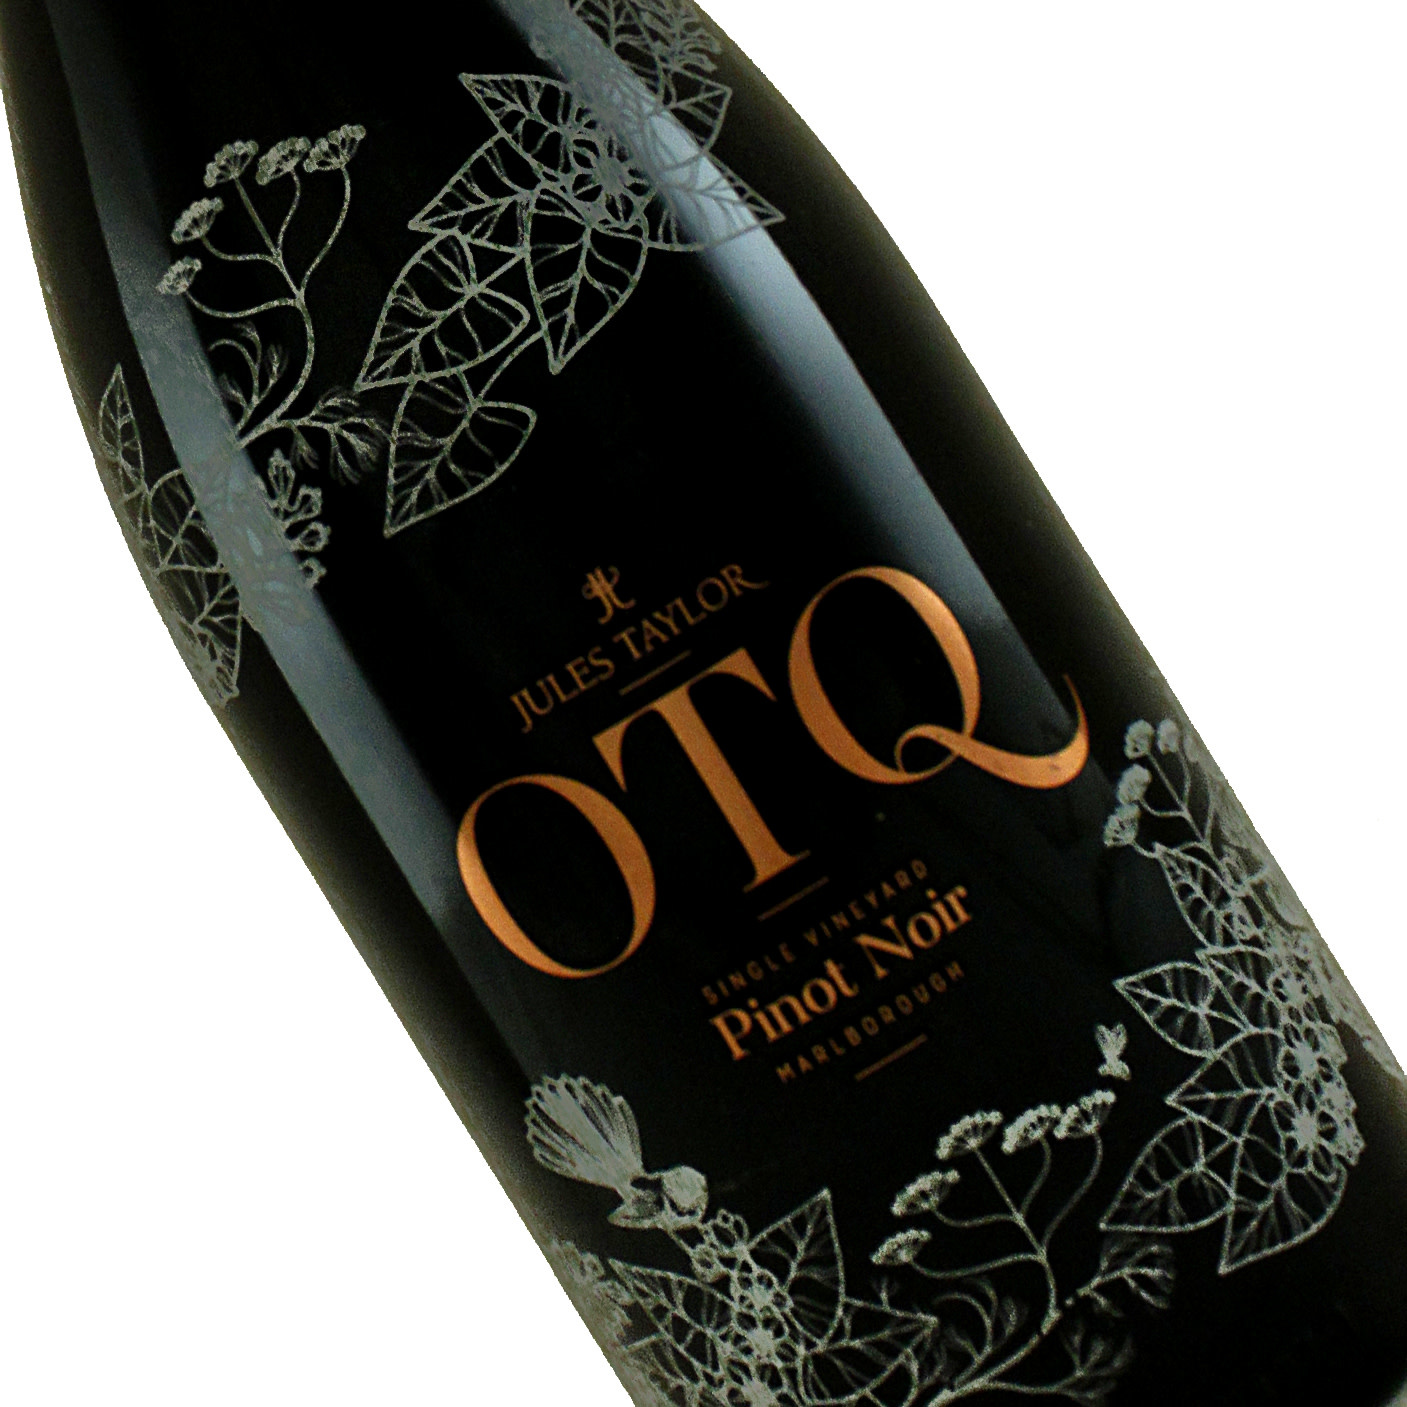 Jules Taylor 2019 Pinot Noir OTQ, New Zealand